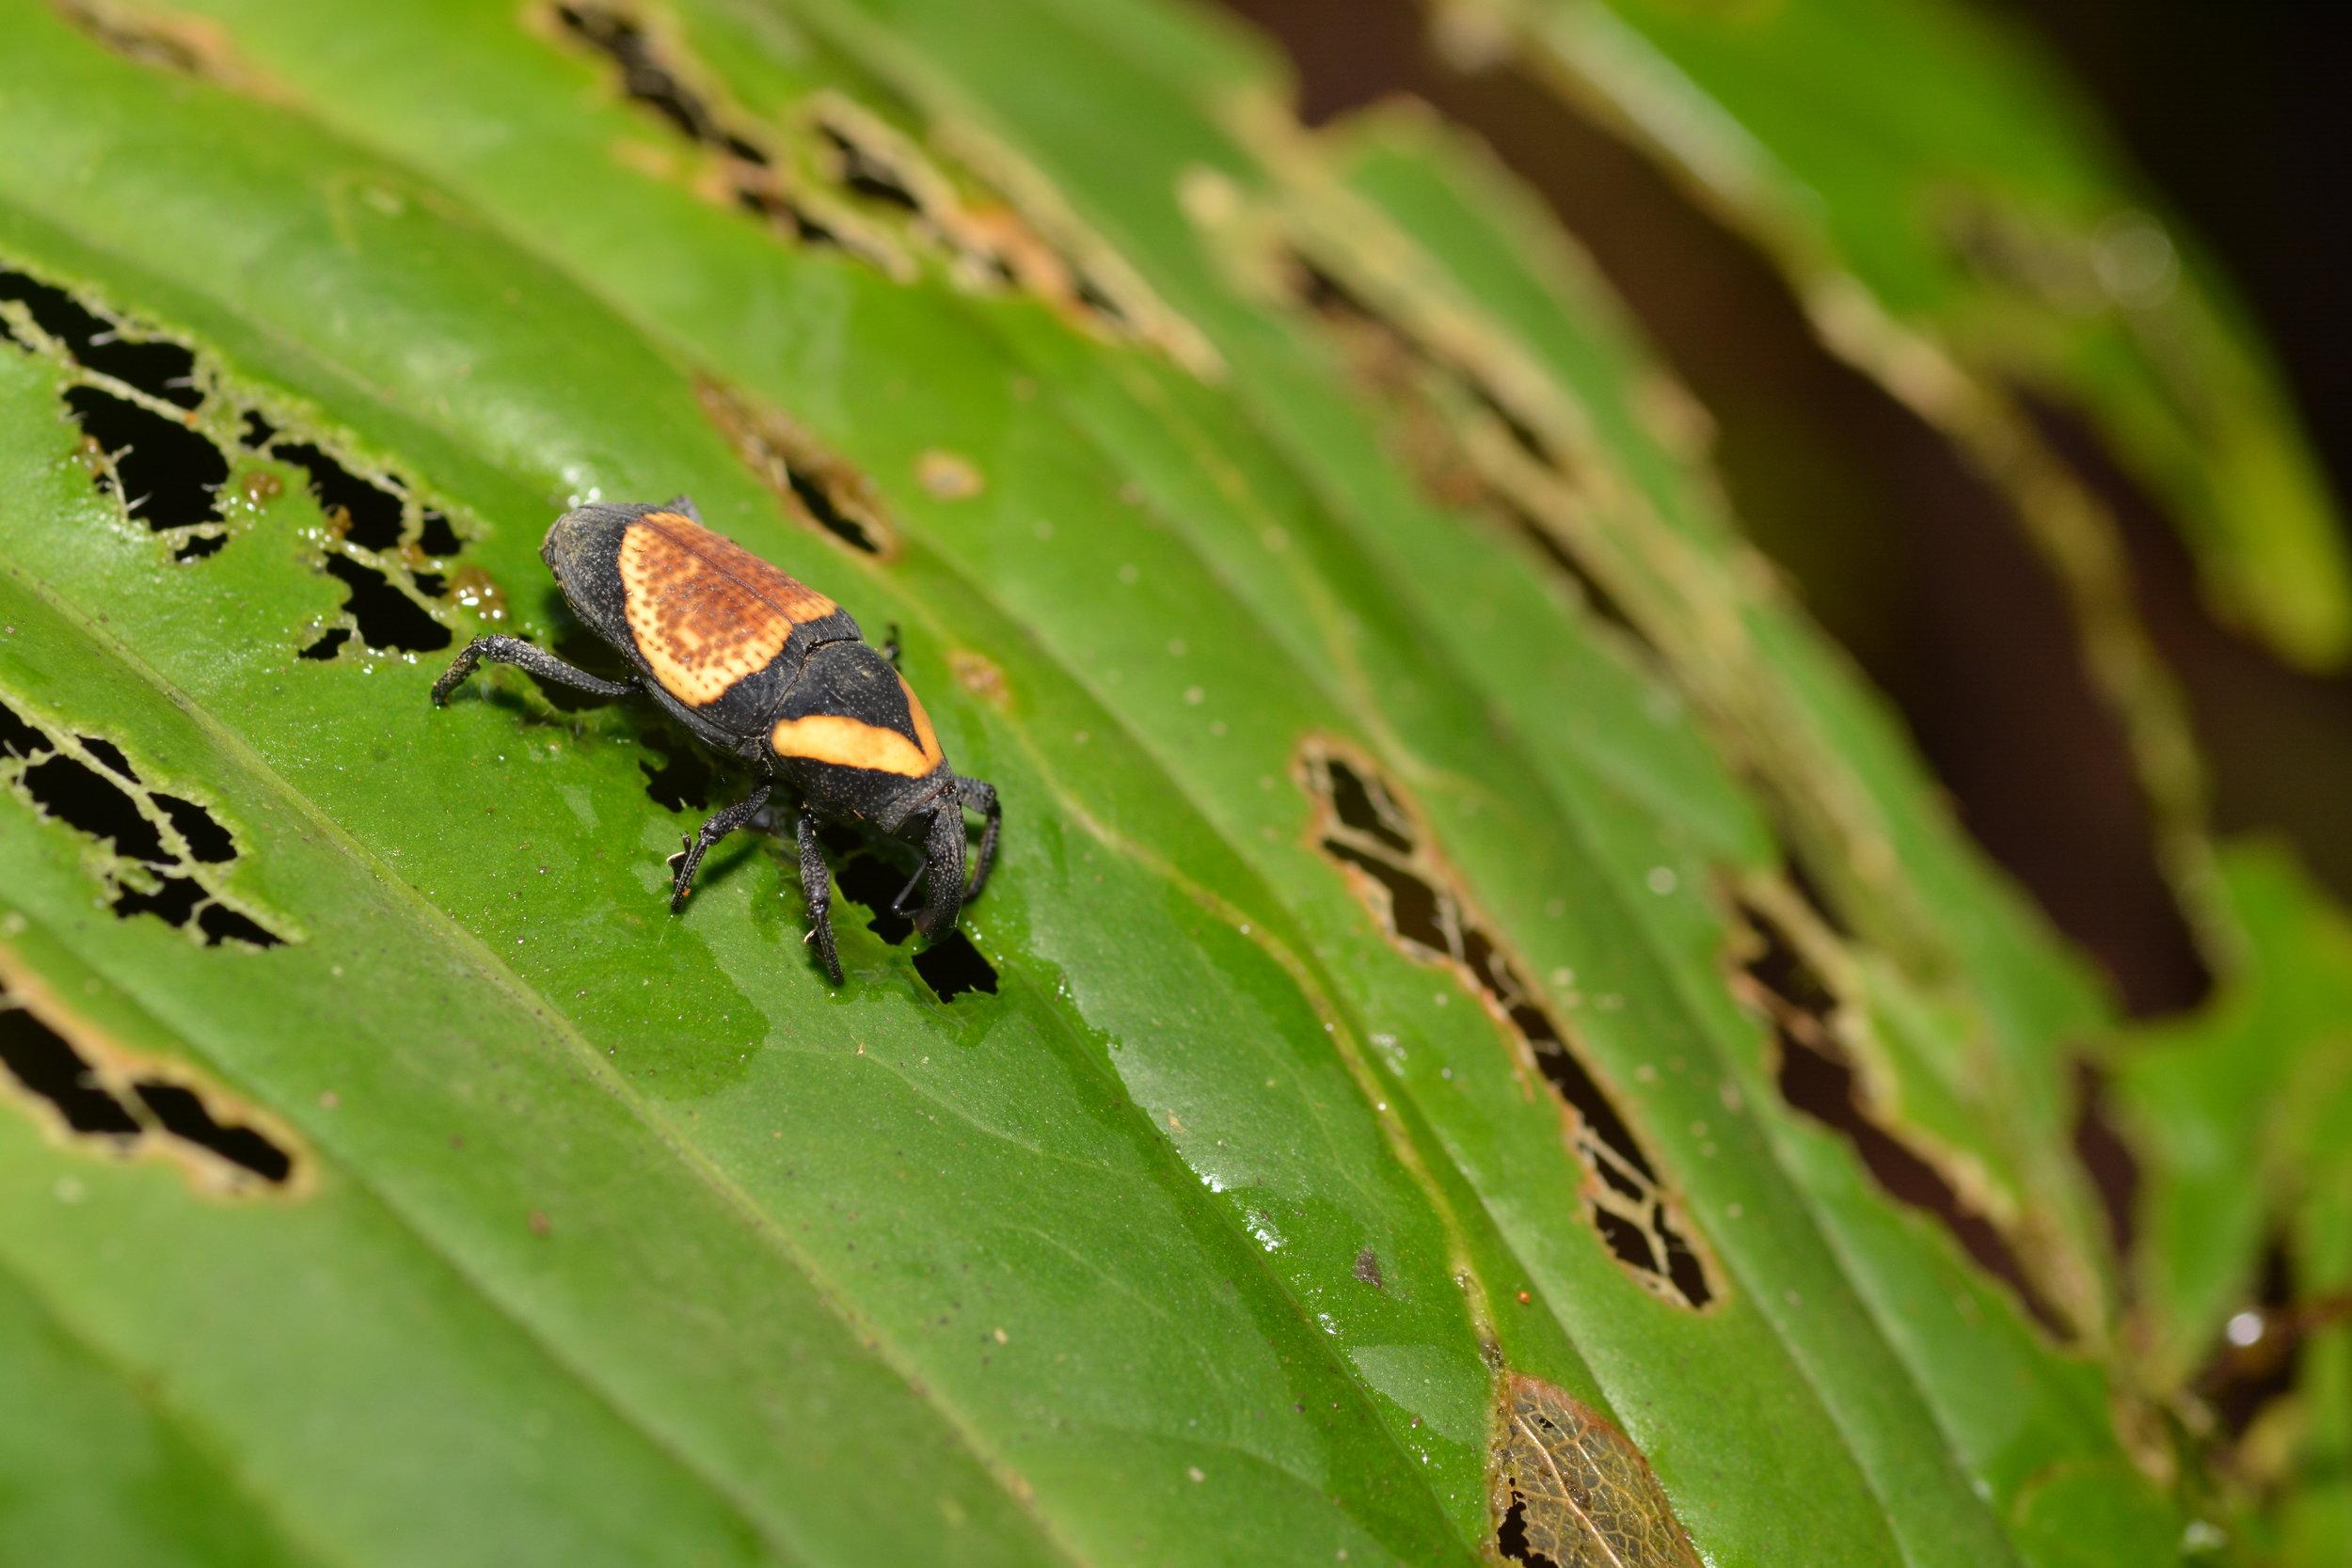 Weevil species, Order: Coleoptera